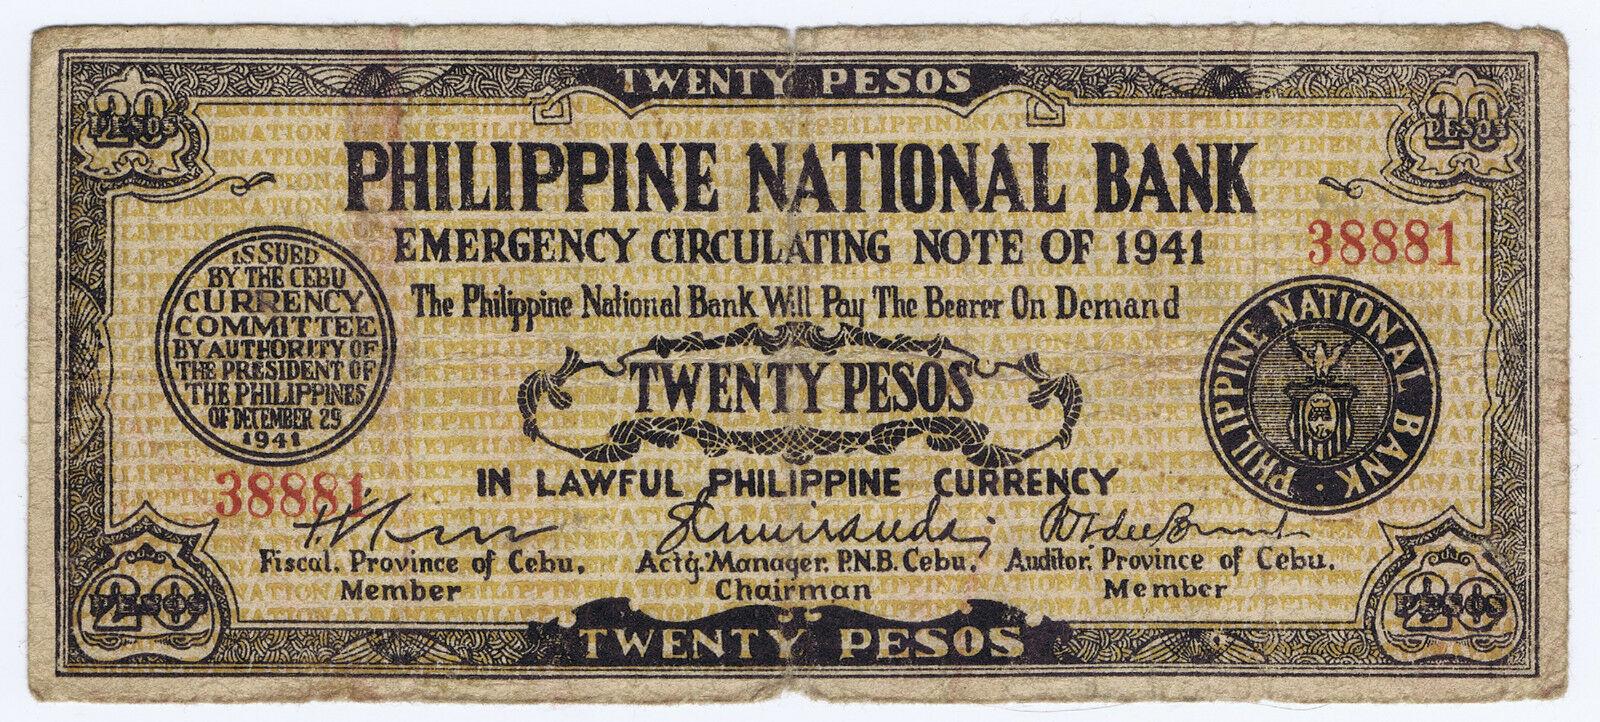 WHOLESALE 100 PHILIPPINES 20 PESOS CEBU GUERILLA of WWII PICK # S 218 NICE CIRC